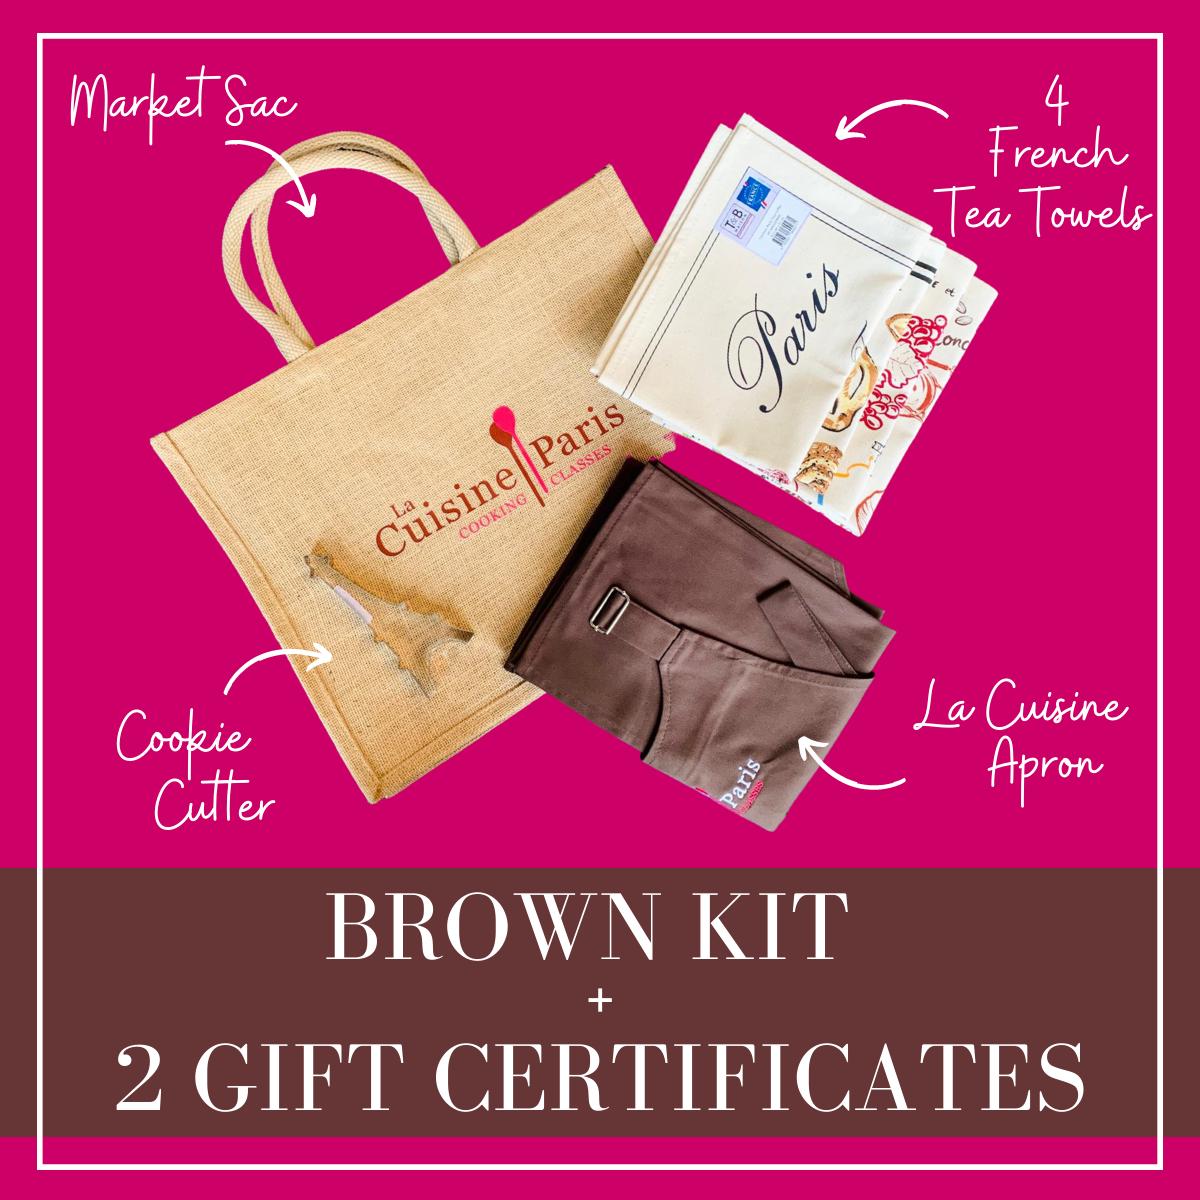 Brown La Cuisine Paris Kit + 2 Video Gift Certificate